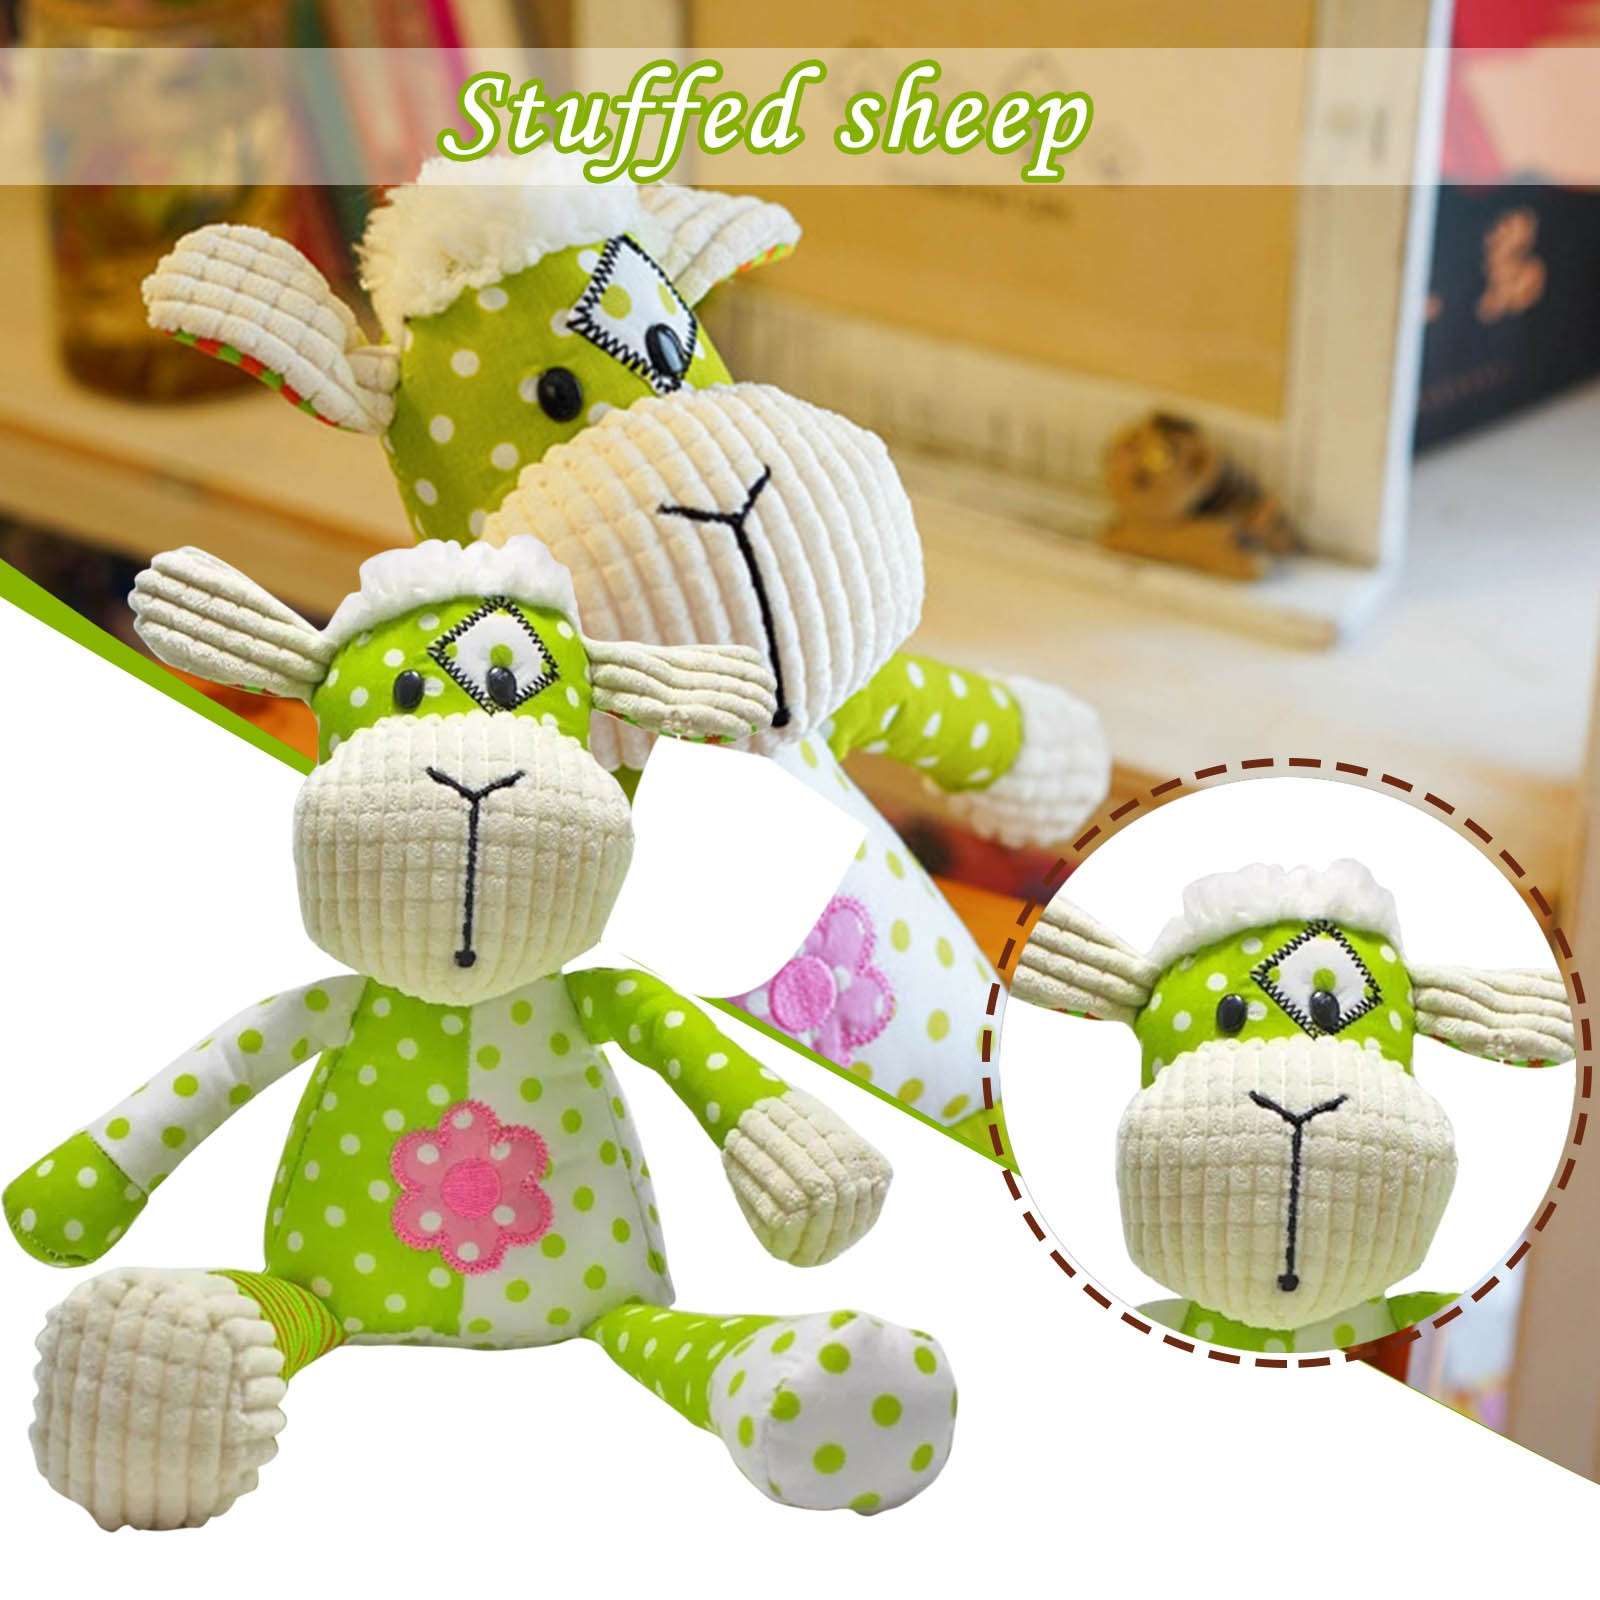 Puzzle Cloth Art Plush Toys To Help Babies Comfort Sleeping Baby Plush Dolls Cartoon Animal Stuffed Plush Toys For Child